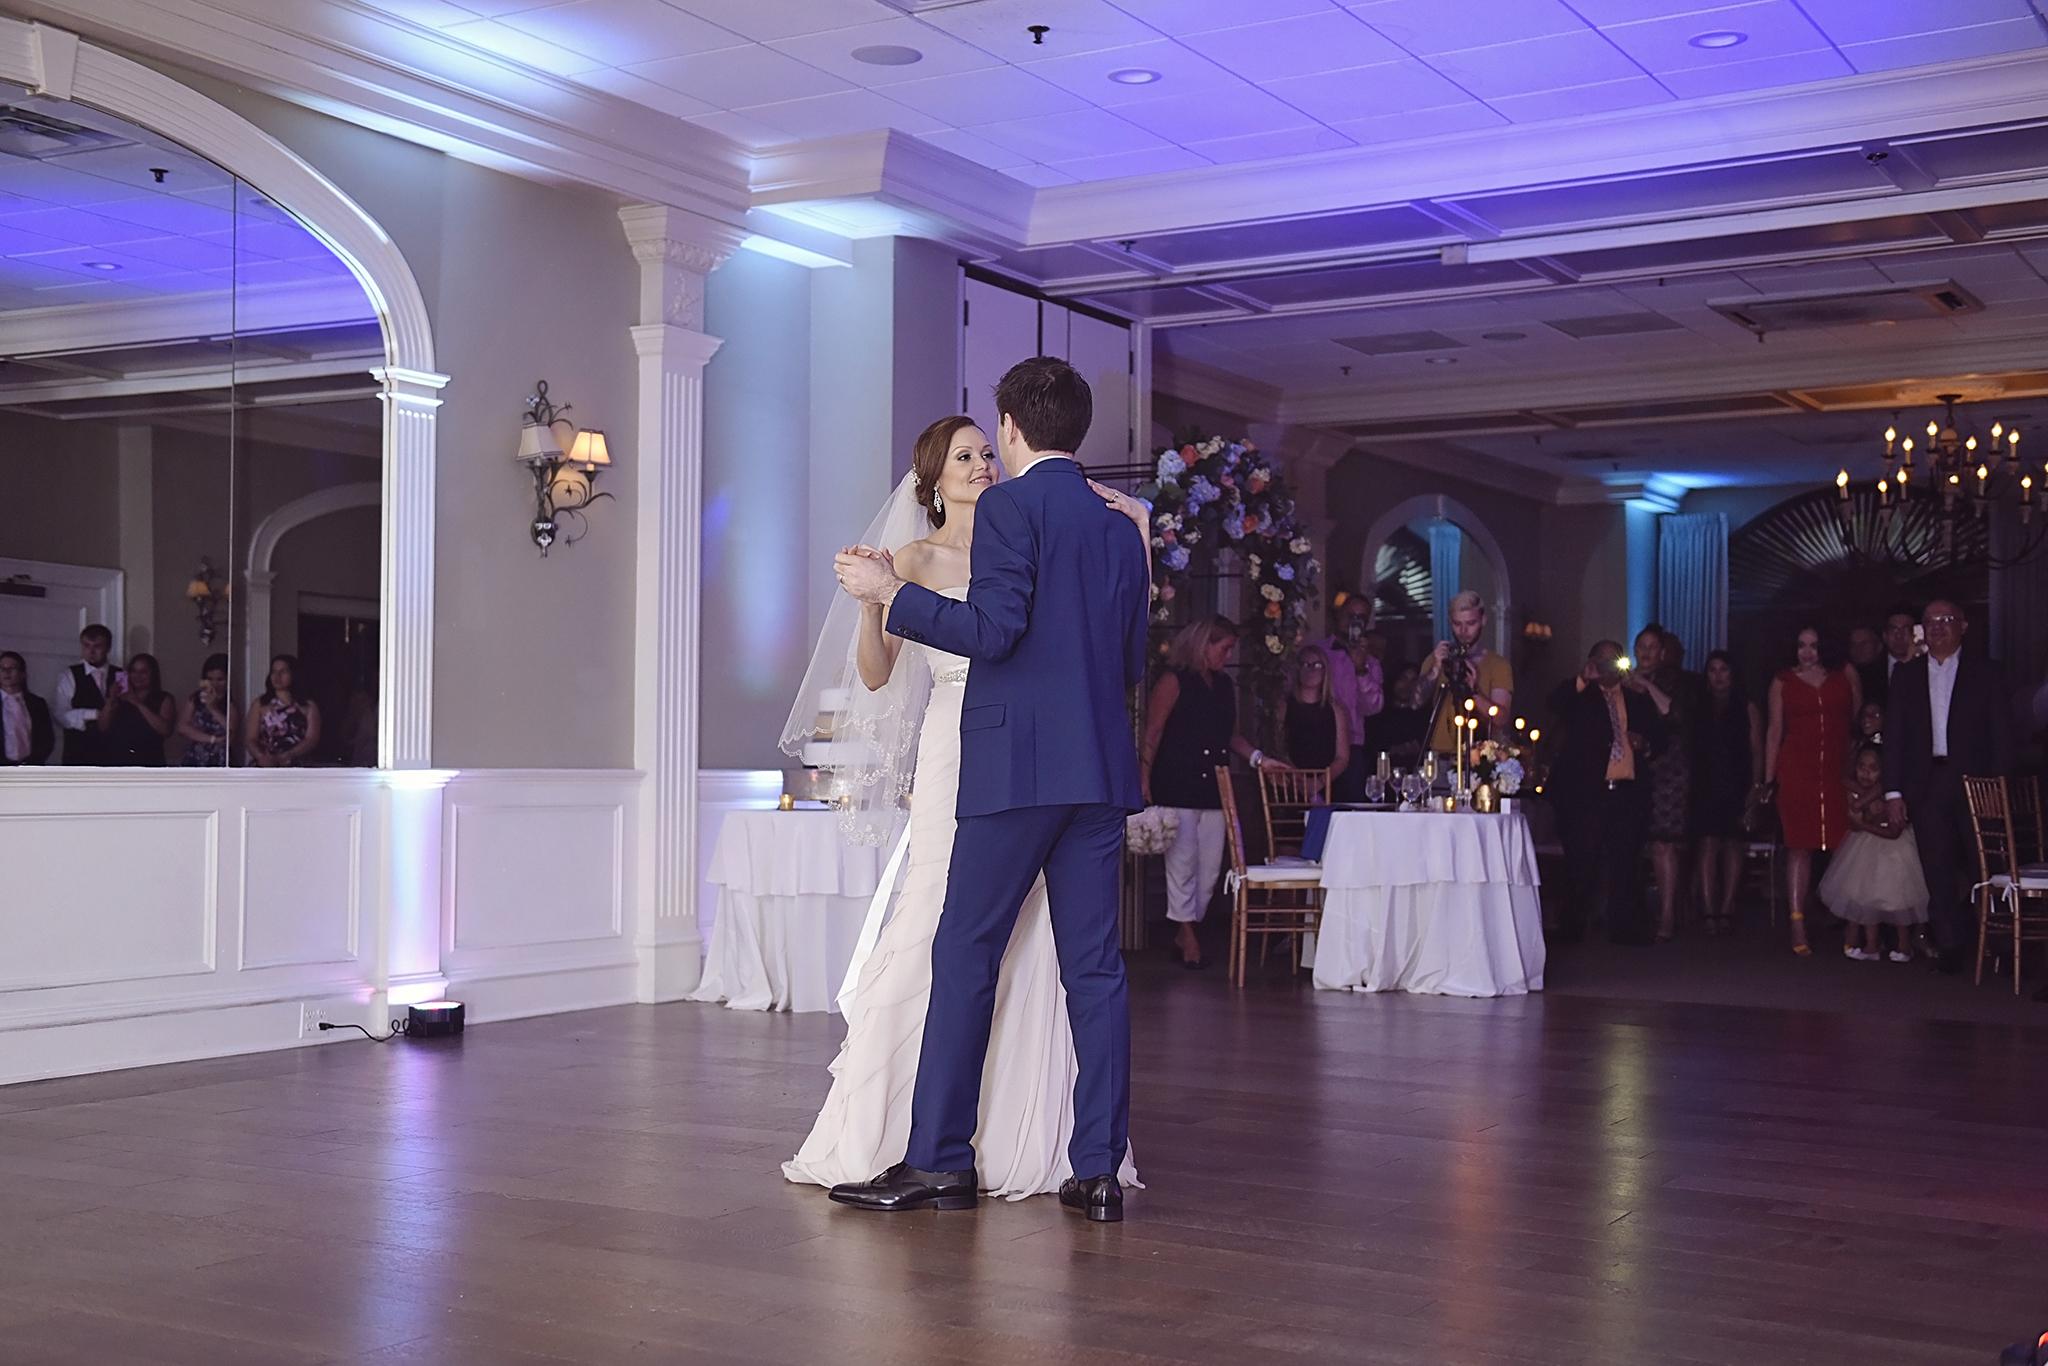 NJ-NY-wedding-photographer-138NJ-NY-wedding-photographer-138NJ-NY-WEDDING-PHOTOGRAPHER-138.JPG